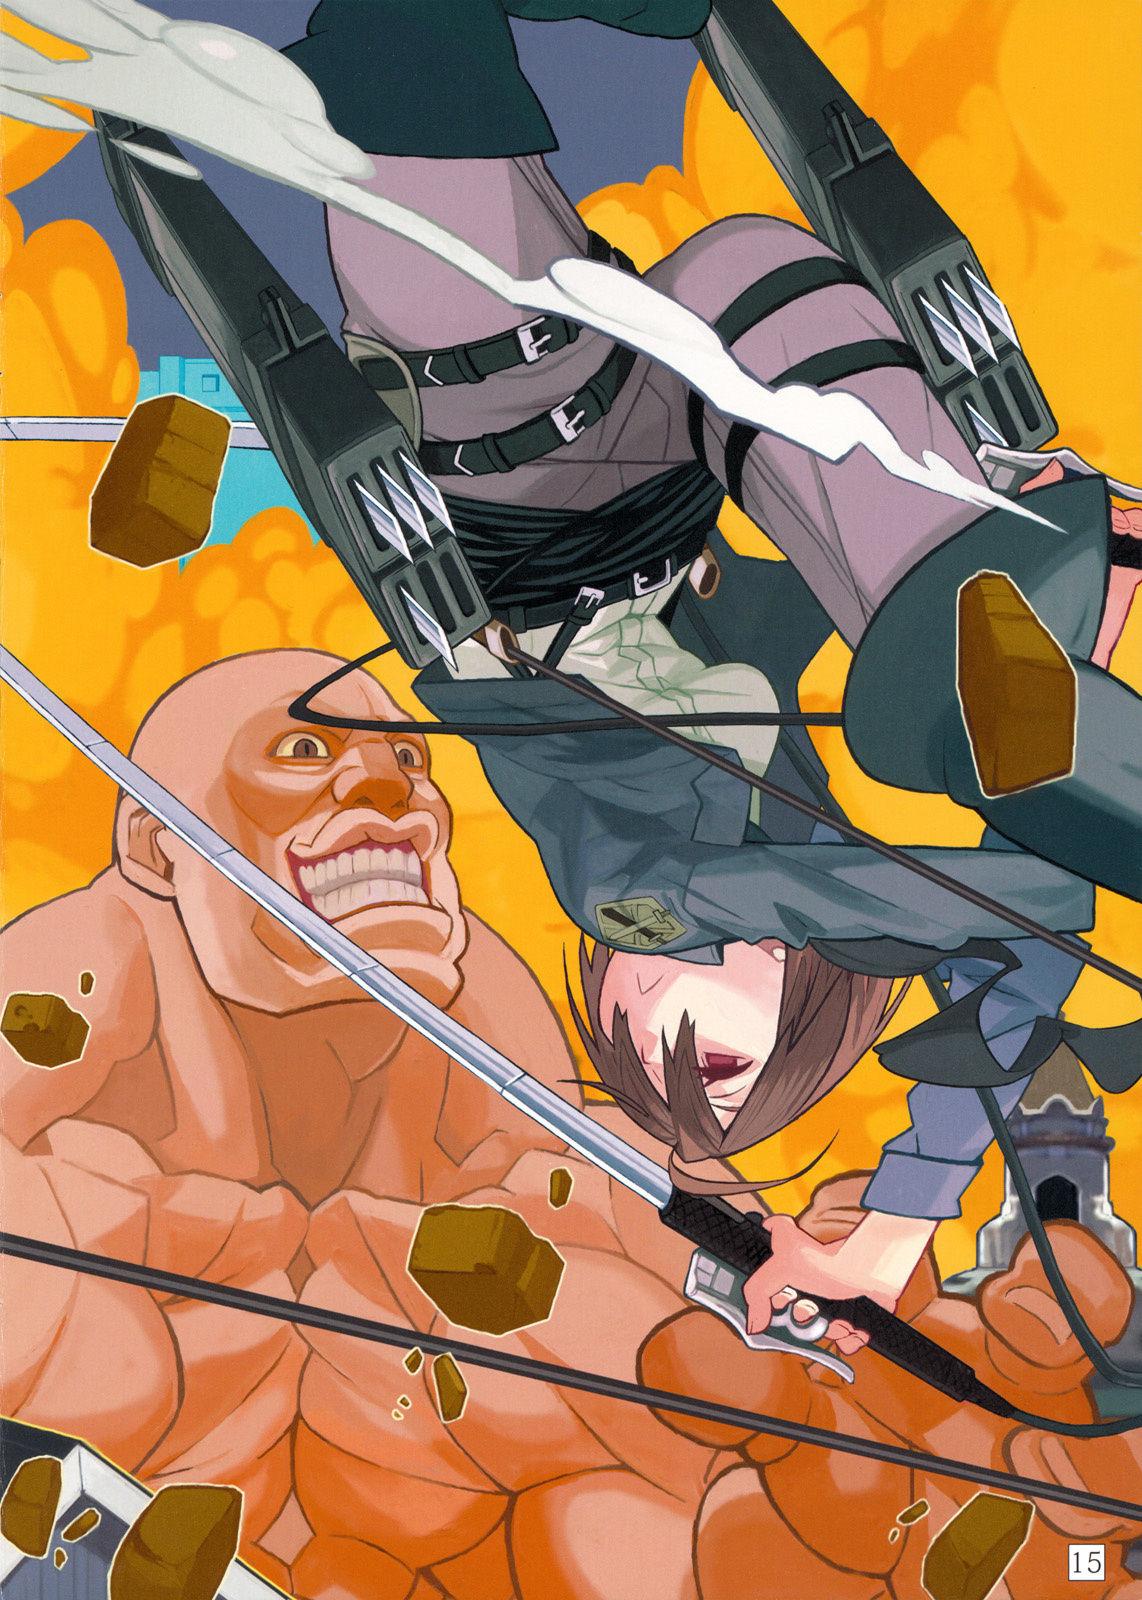 Shinngeki vol 1 hentai manga picture 12